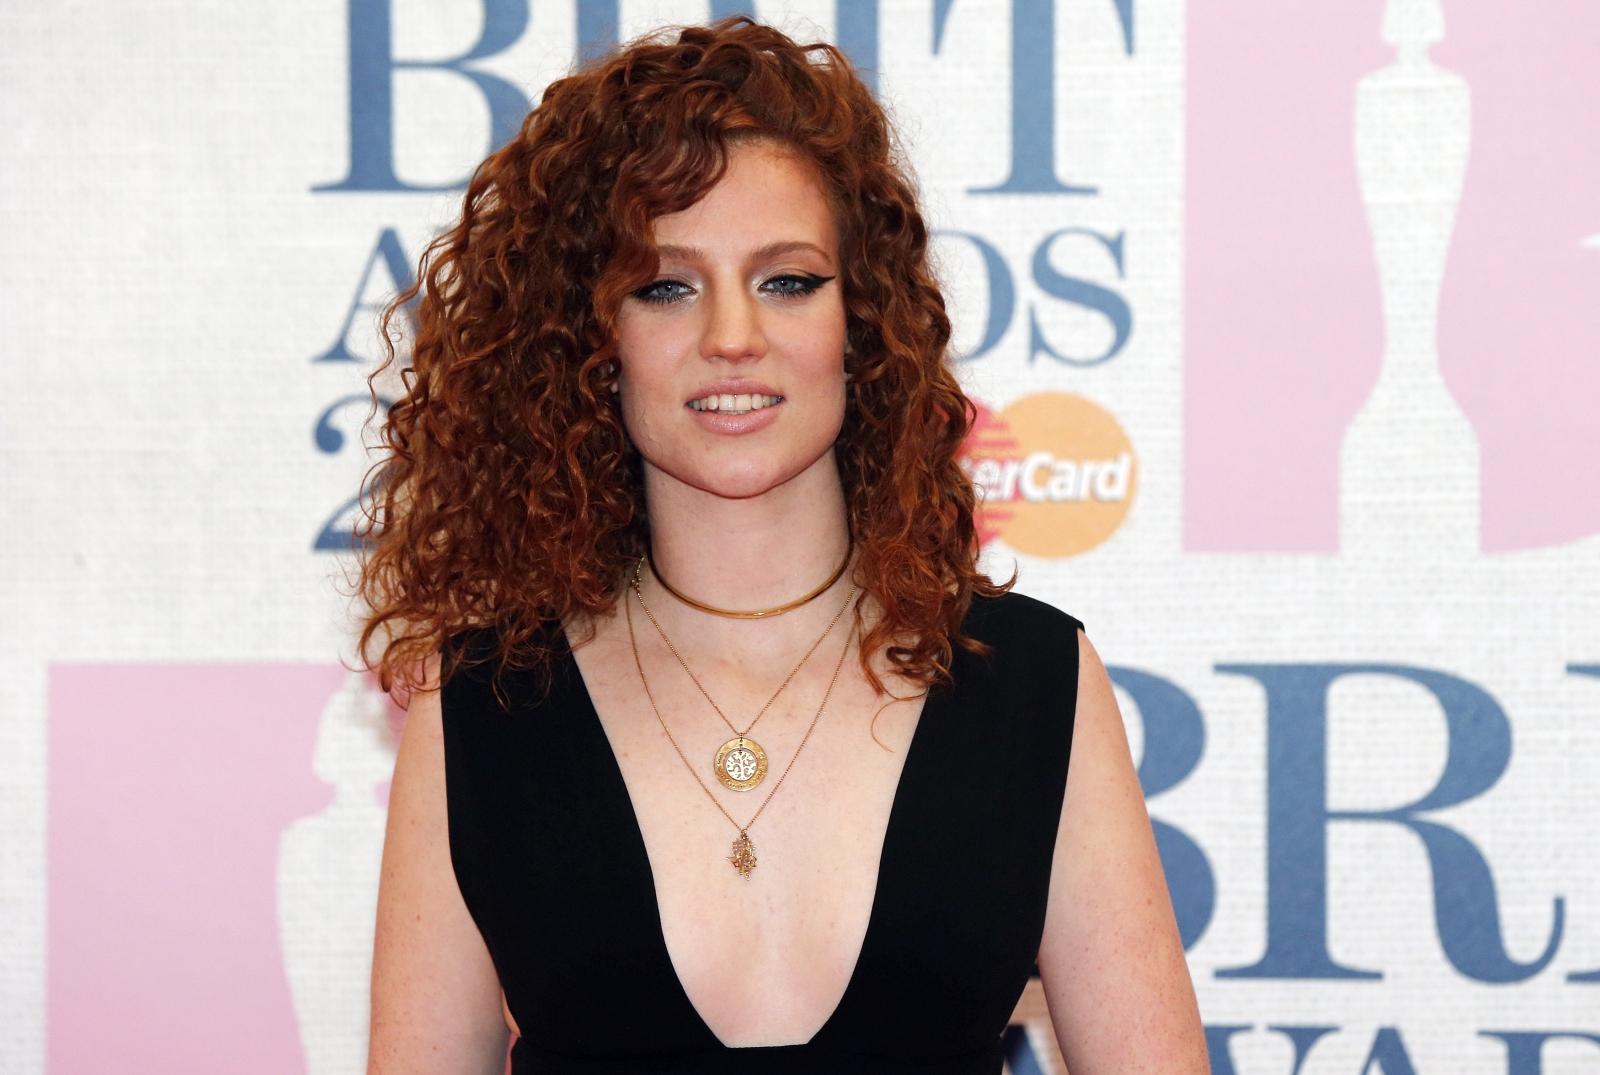 Jess Glynne at the BRIT Awards